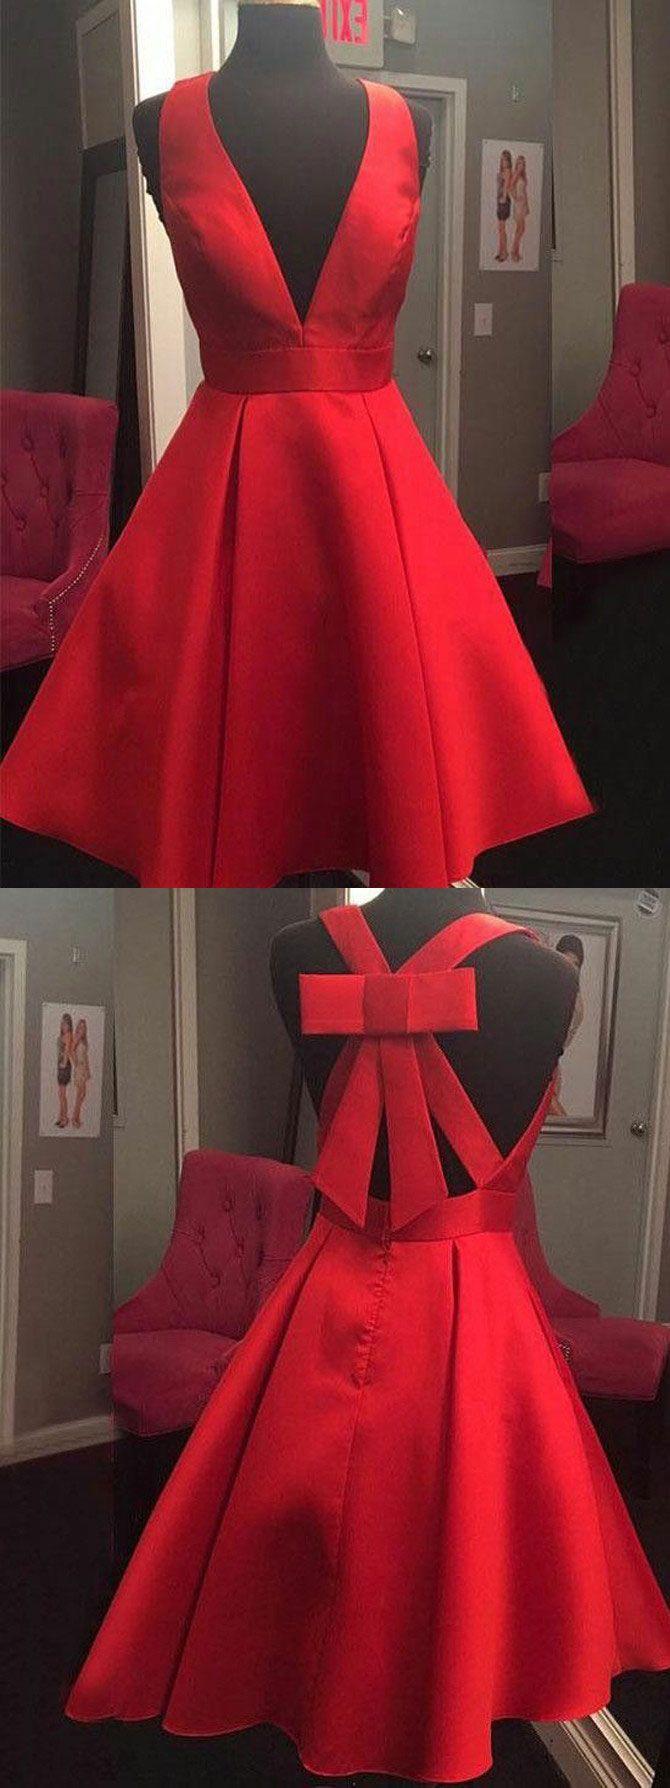 Red homecoming dresses short homecoming dresses deep v neck